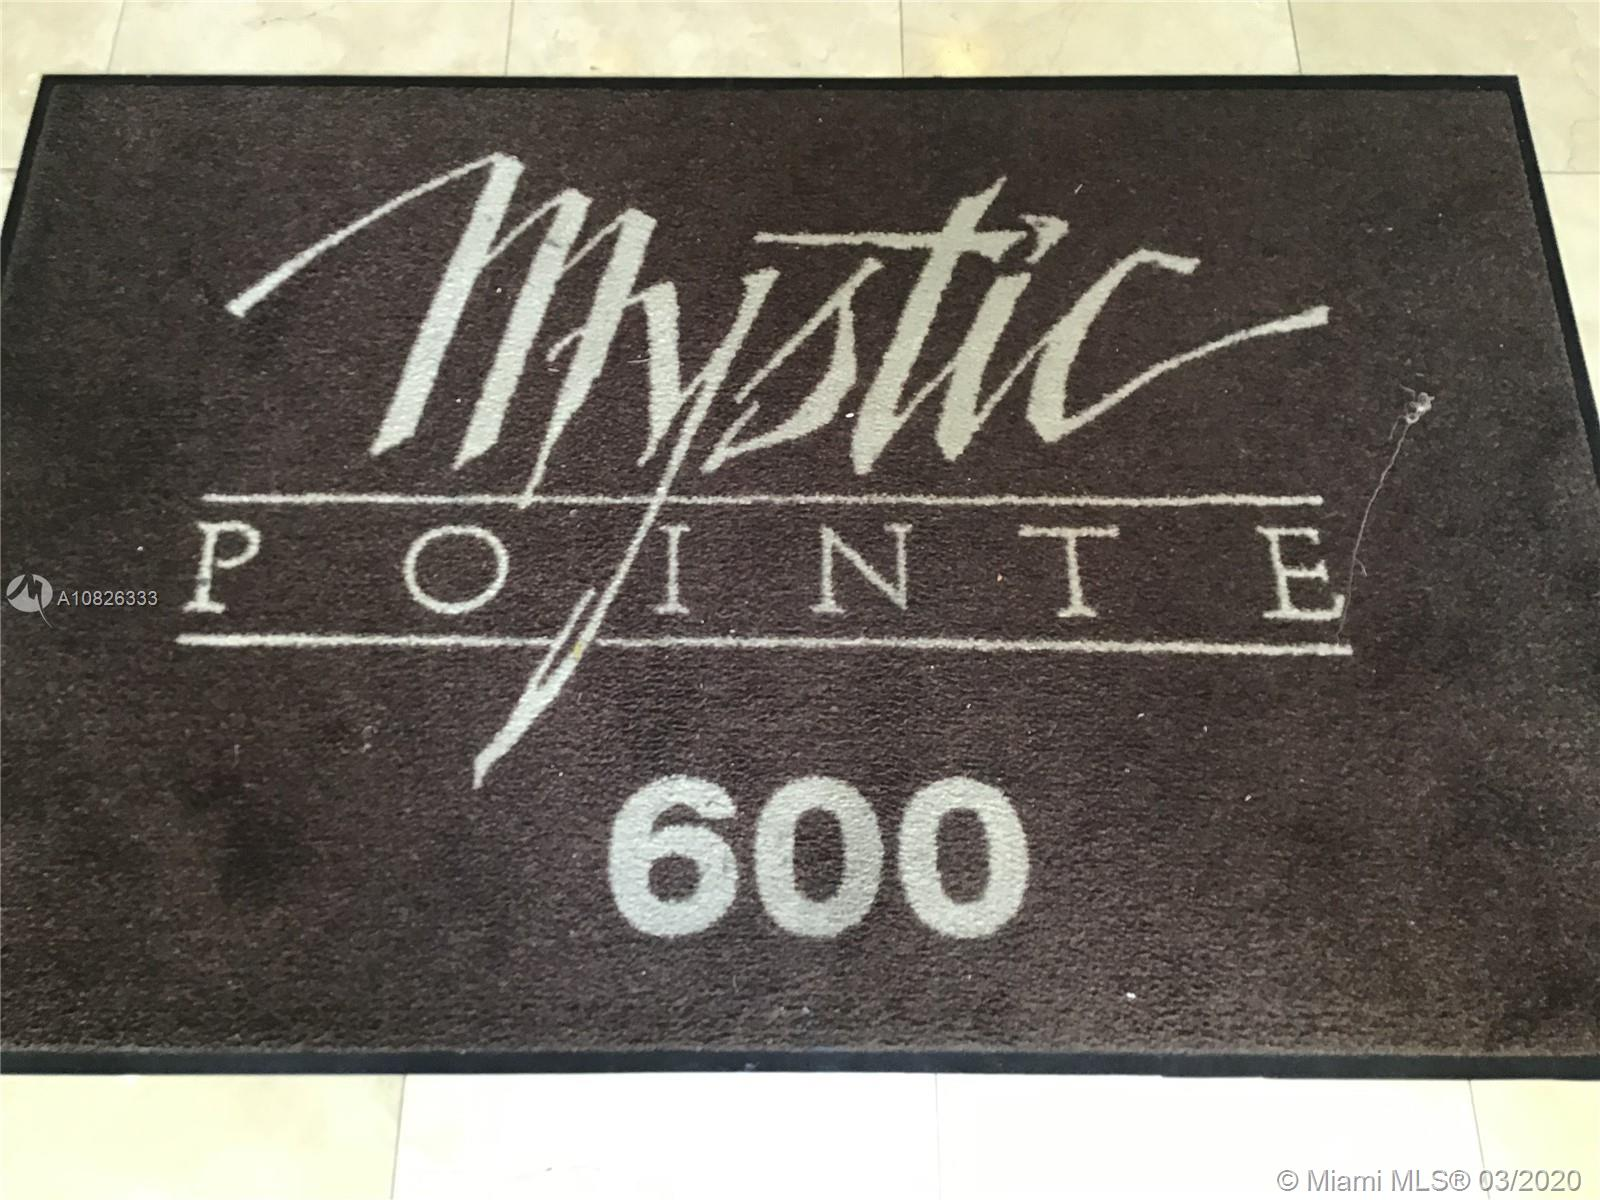 Photo of 3400 192nd St #402, Aventura, Florida, 33180 - MYSTIC POINTE 600 HALLWAYS